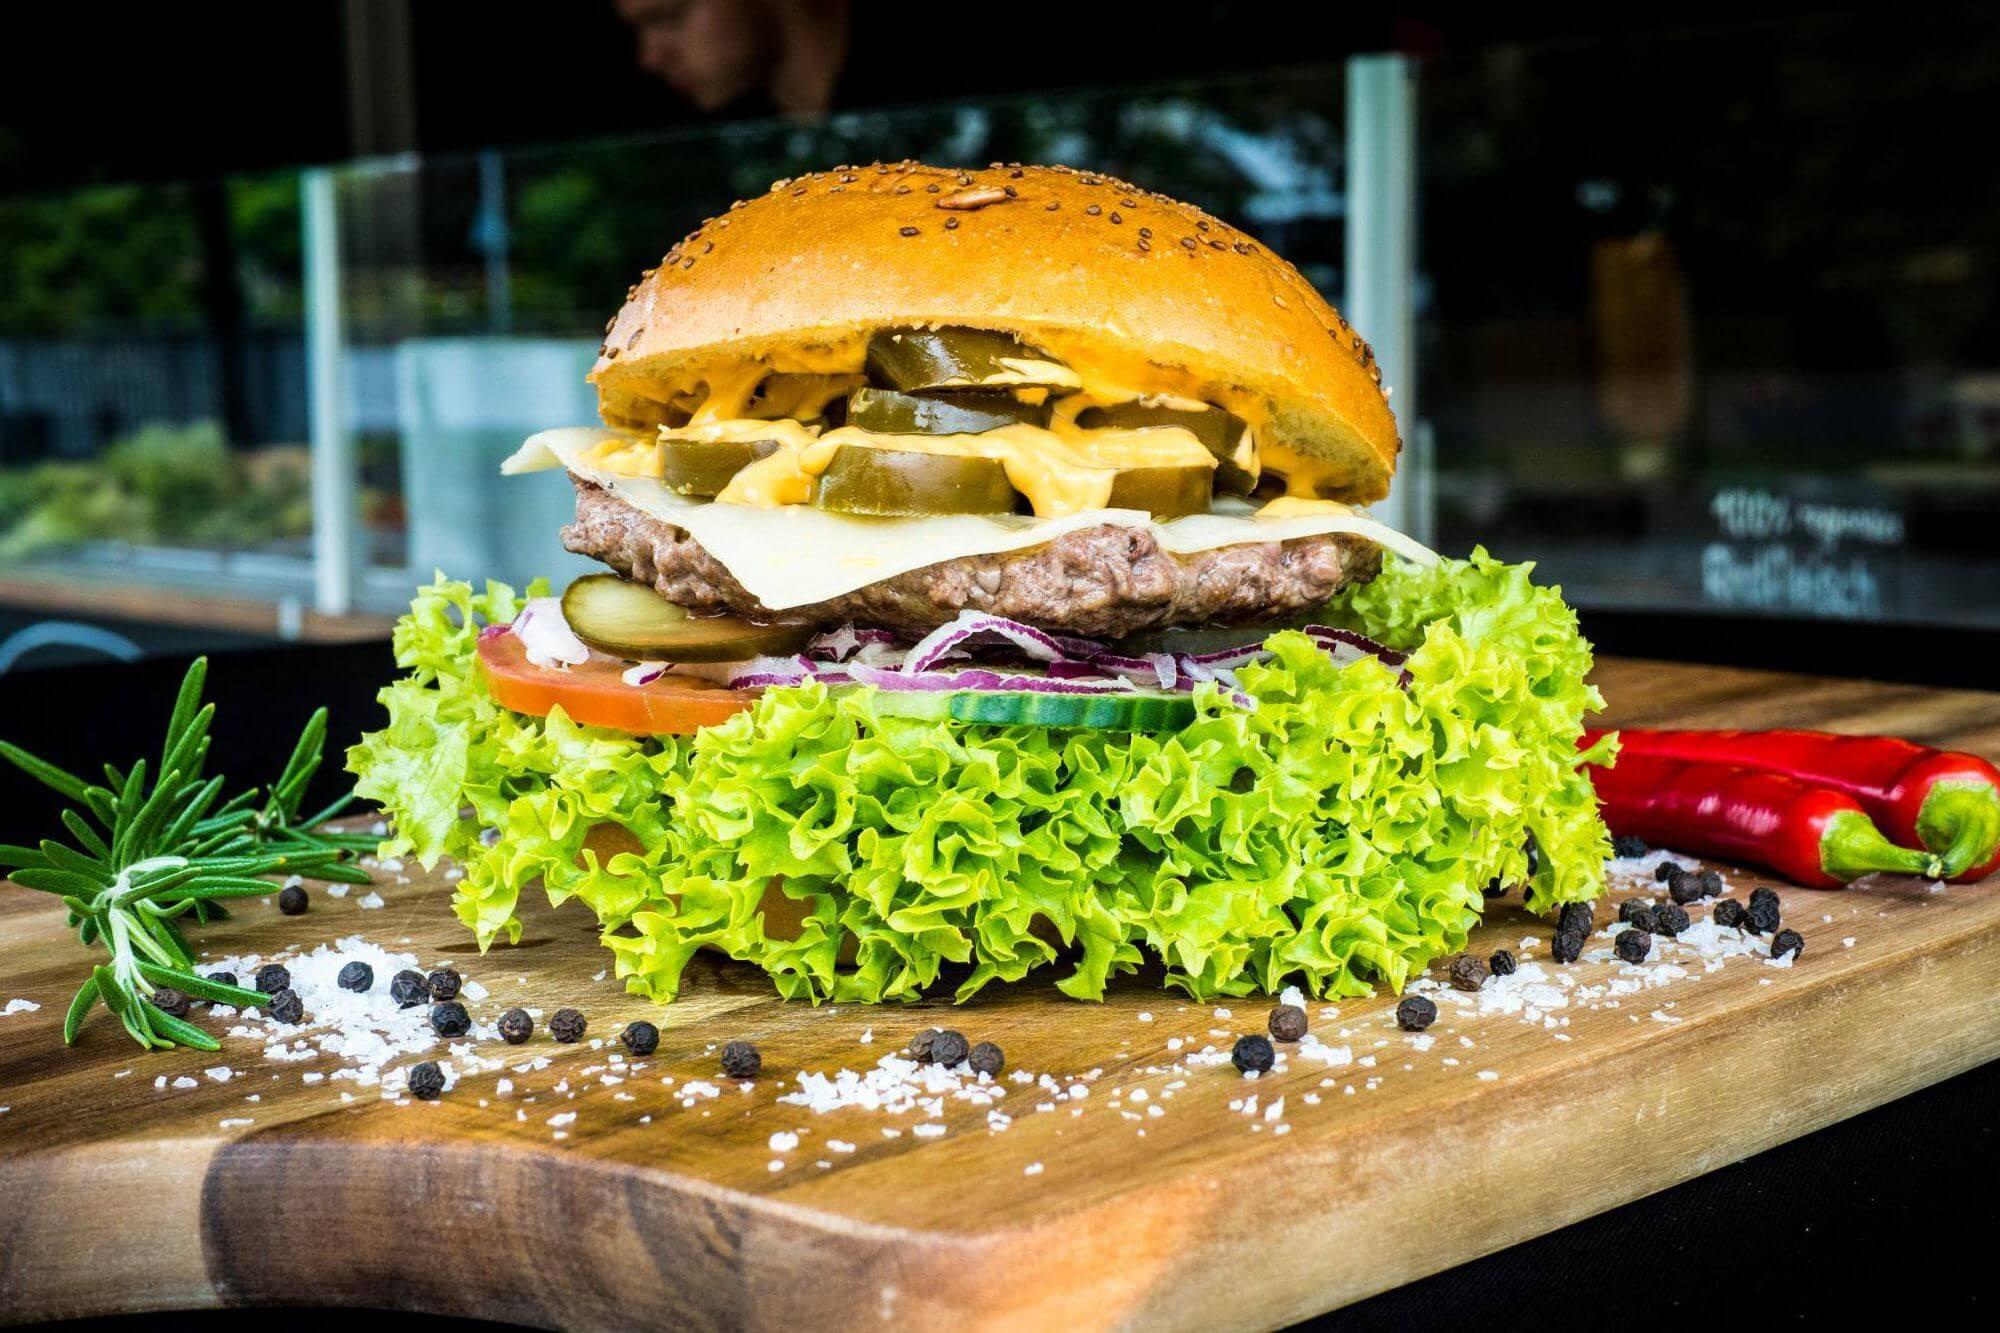 Lieblingsburger Burger Fritten Streetfood Foodtruck Catering